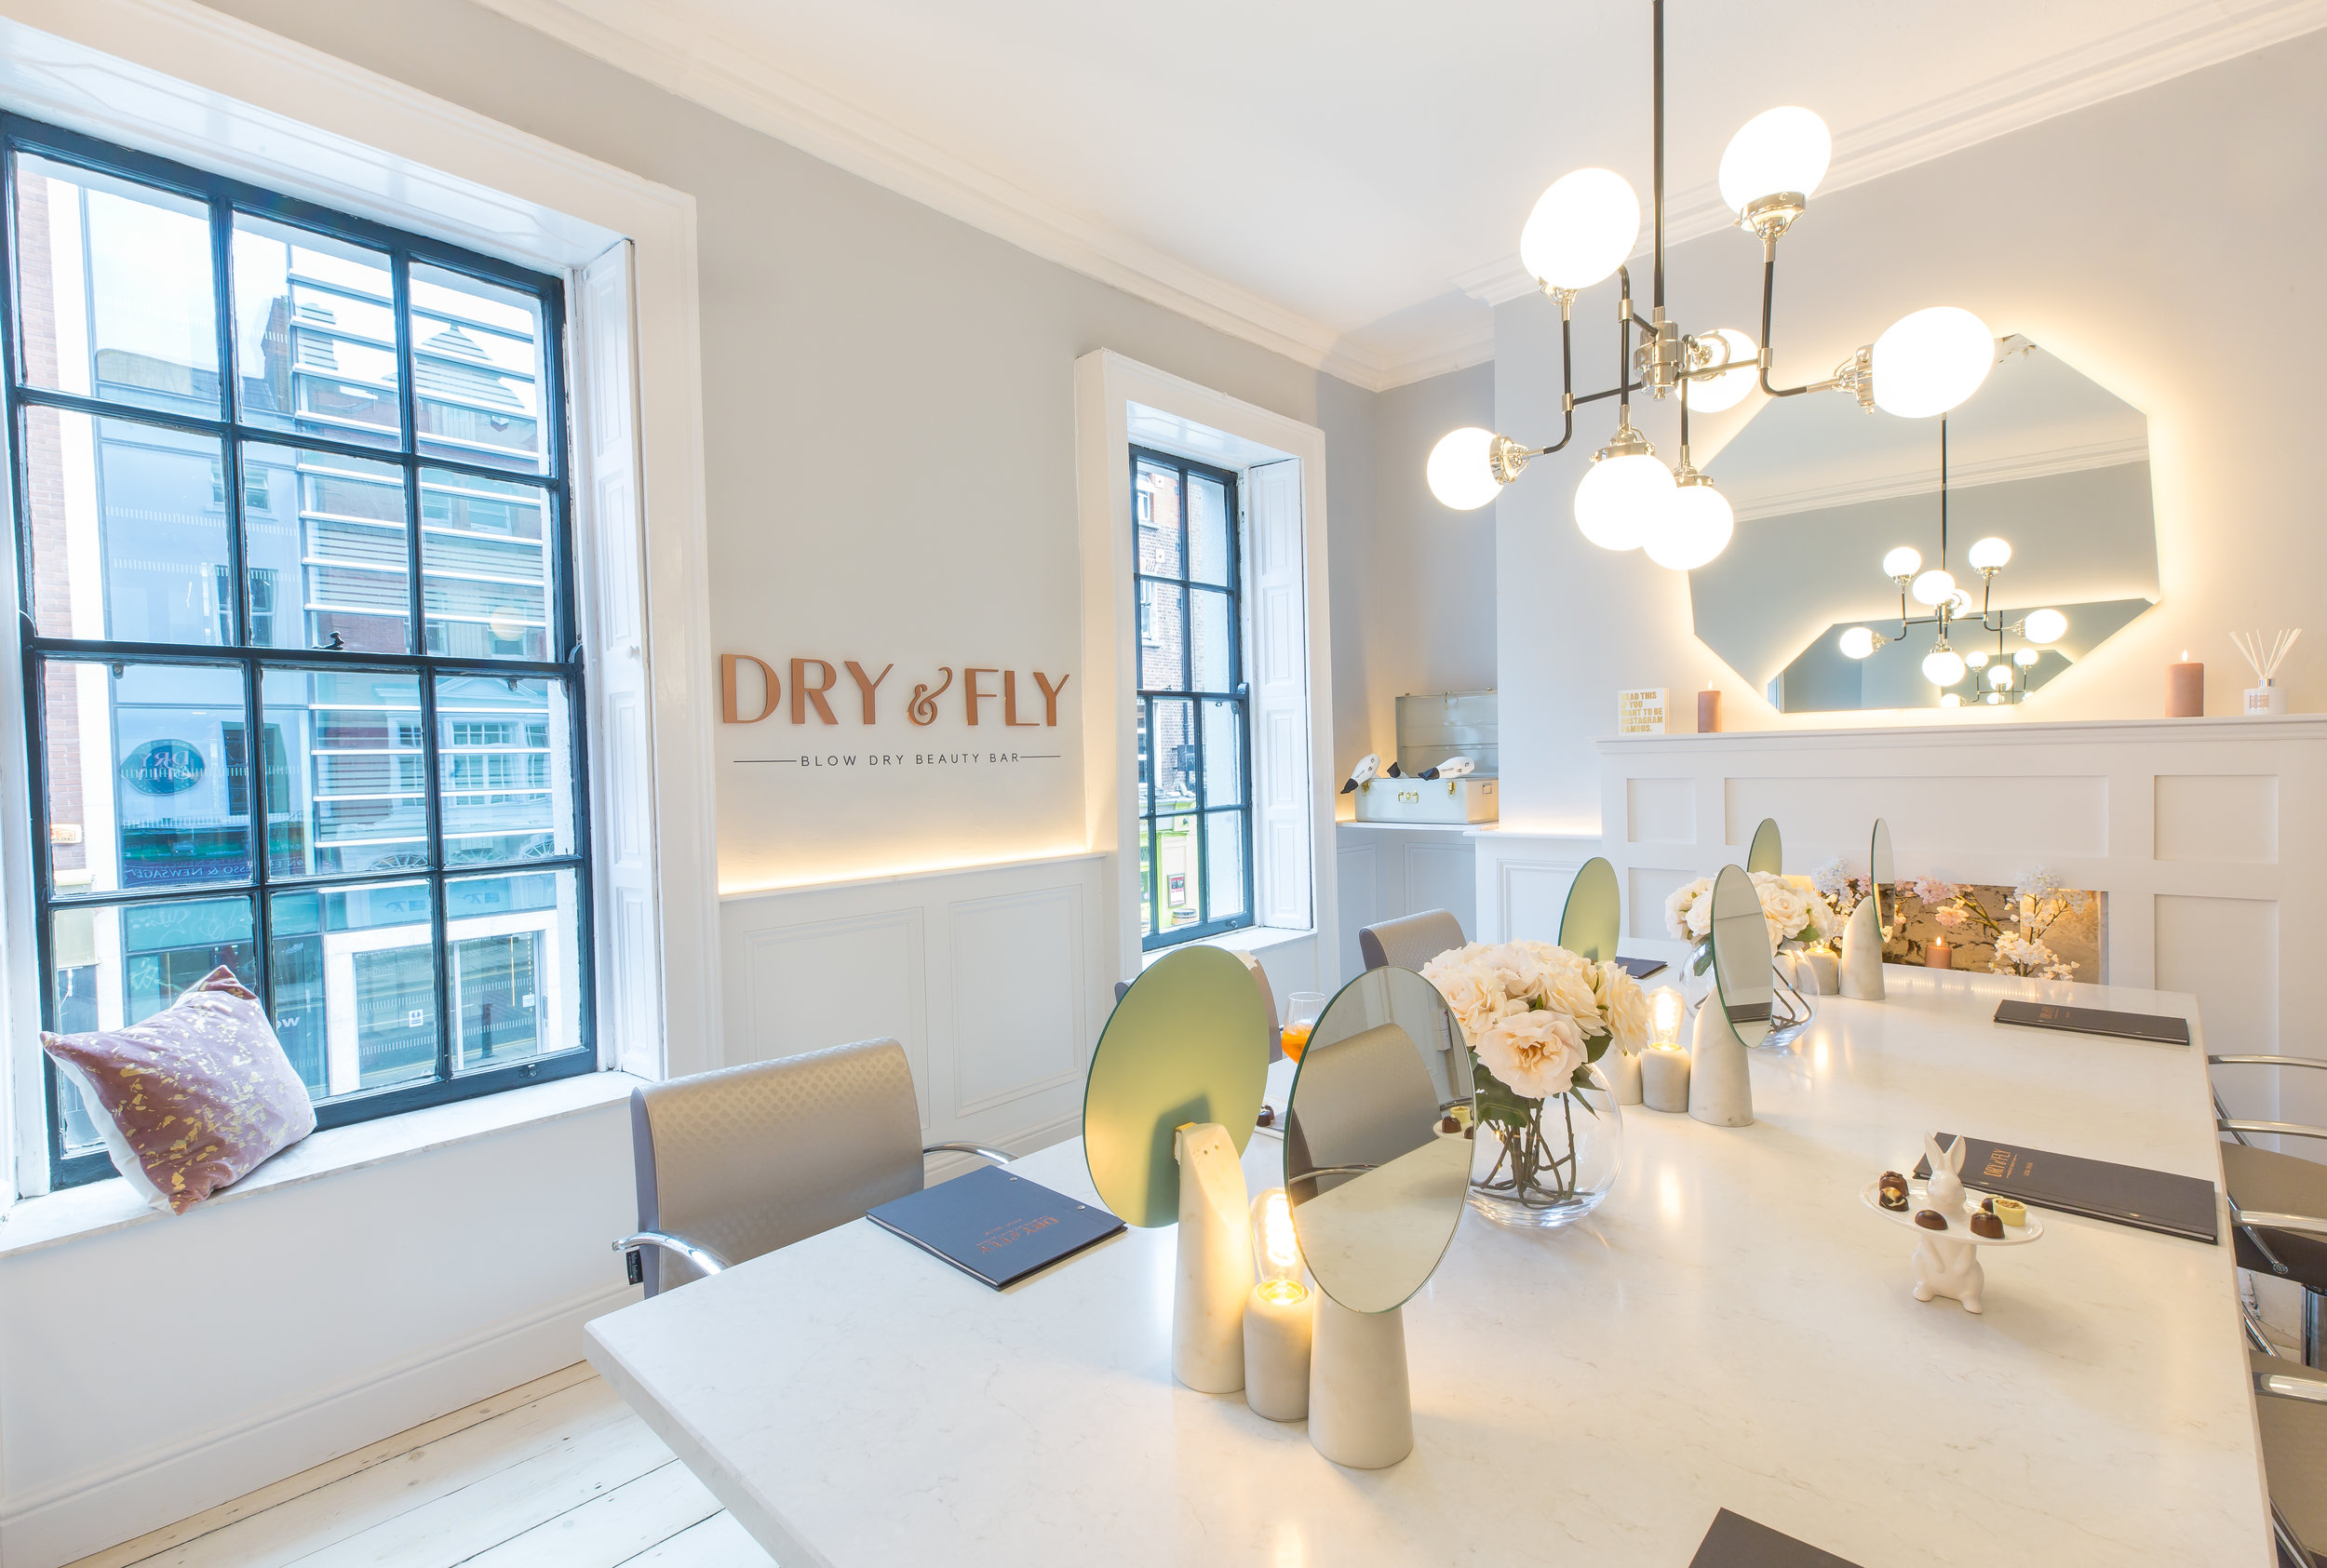 Dry & Fly - Merrion Row_-44.jpg